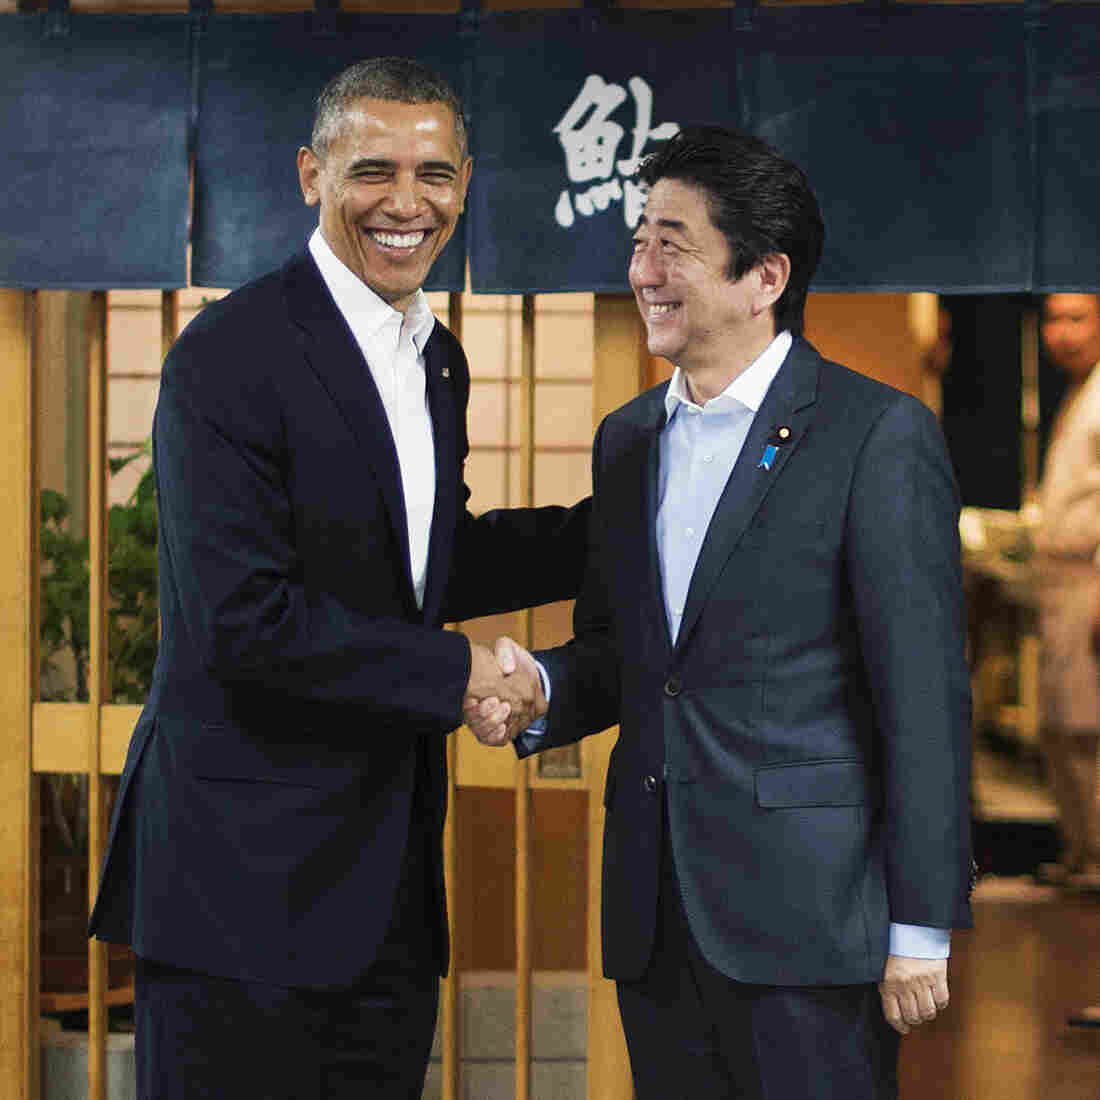 Obama Gets A Taste Of Jiro's 'Dream' Sushi In Name Of Diplomacy